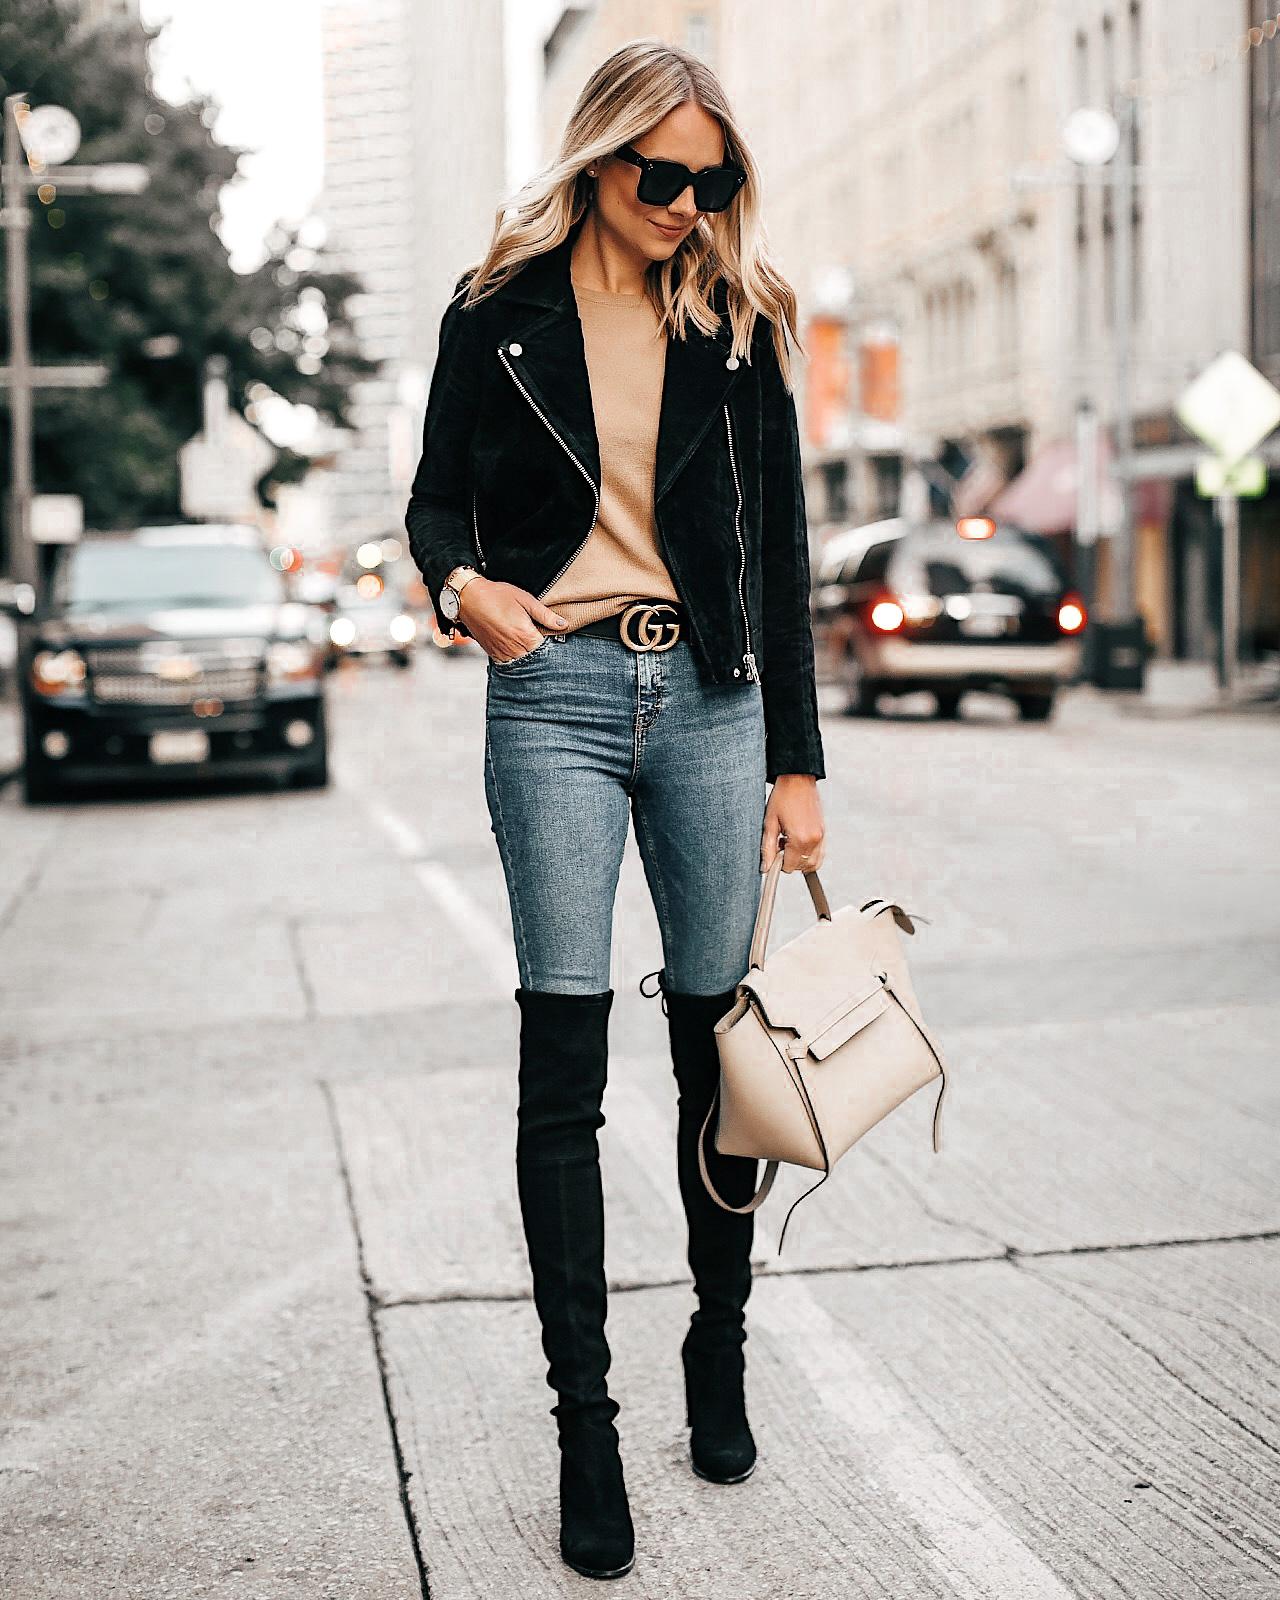 Fashion Jackson Wearing Black Suede Jacket Black Over the Knee Boots Gucci Belt Tan Sweater Denim Skinny Jeans